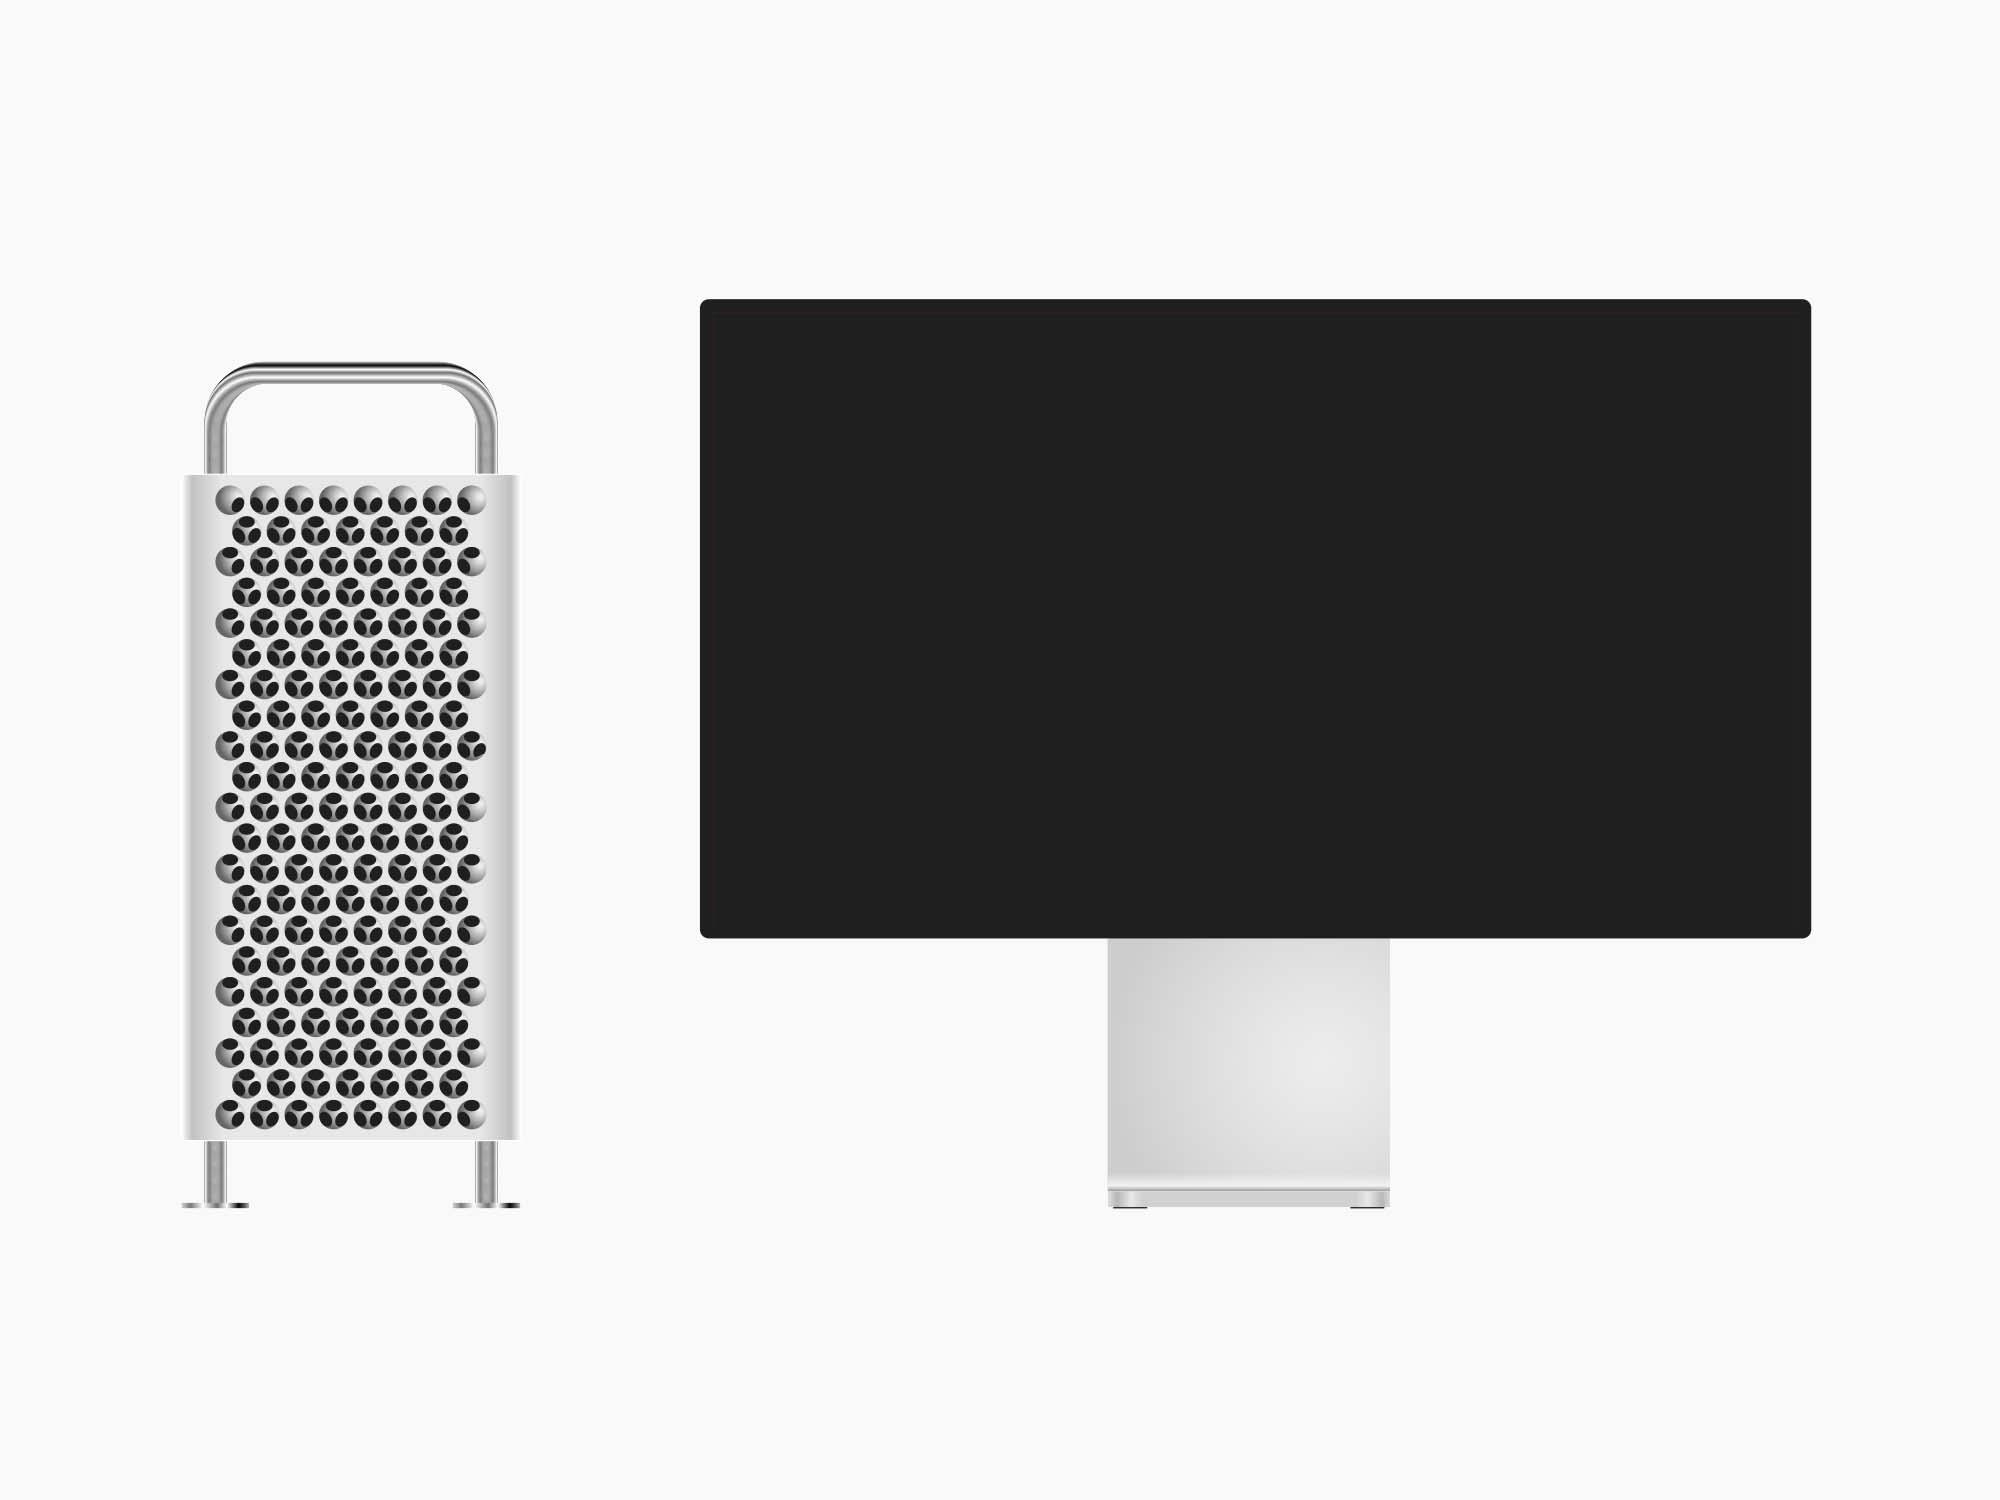 Mac Pro Mockup 2019